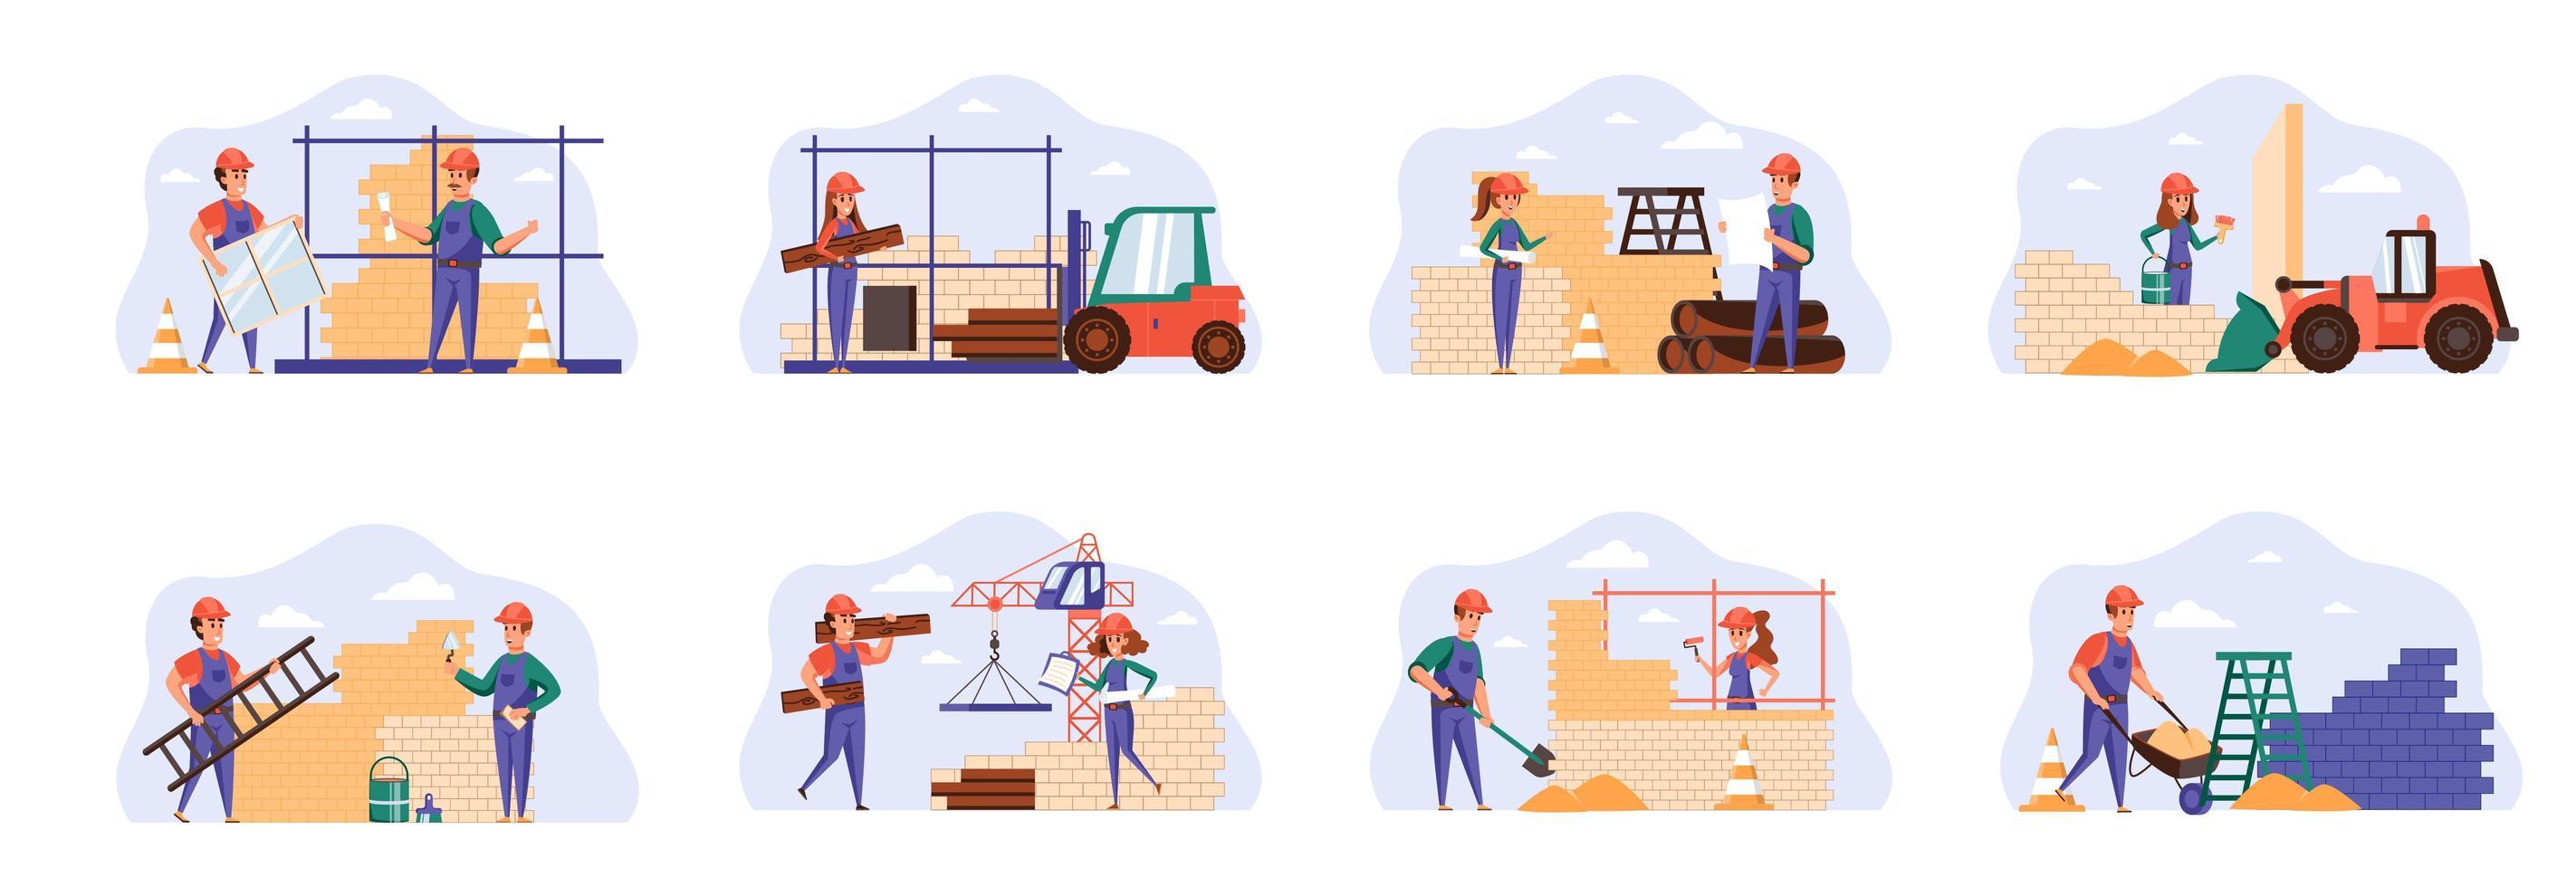 Builderszenen bündeln sich mit Personencharakteren. vektor